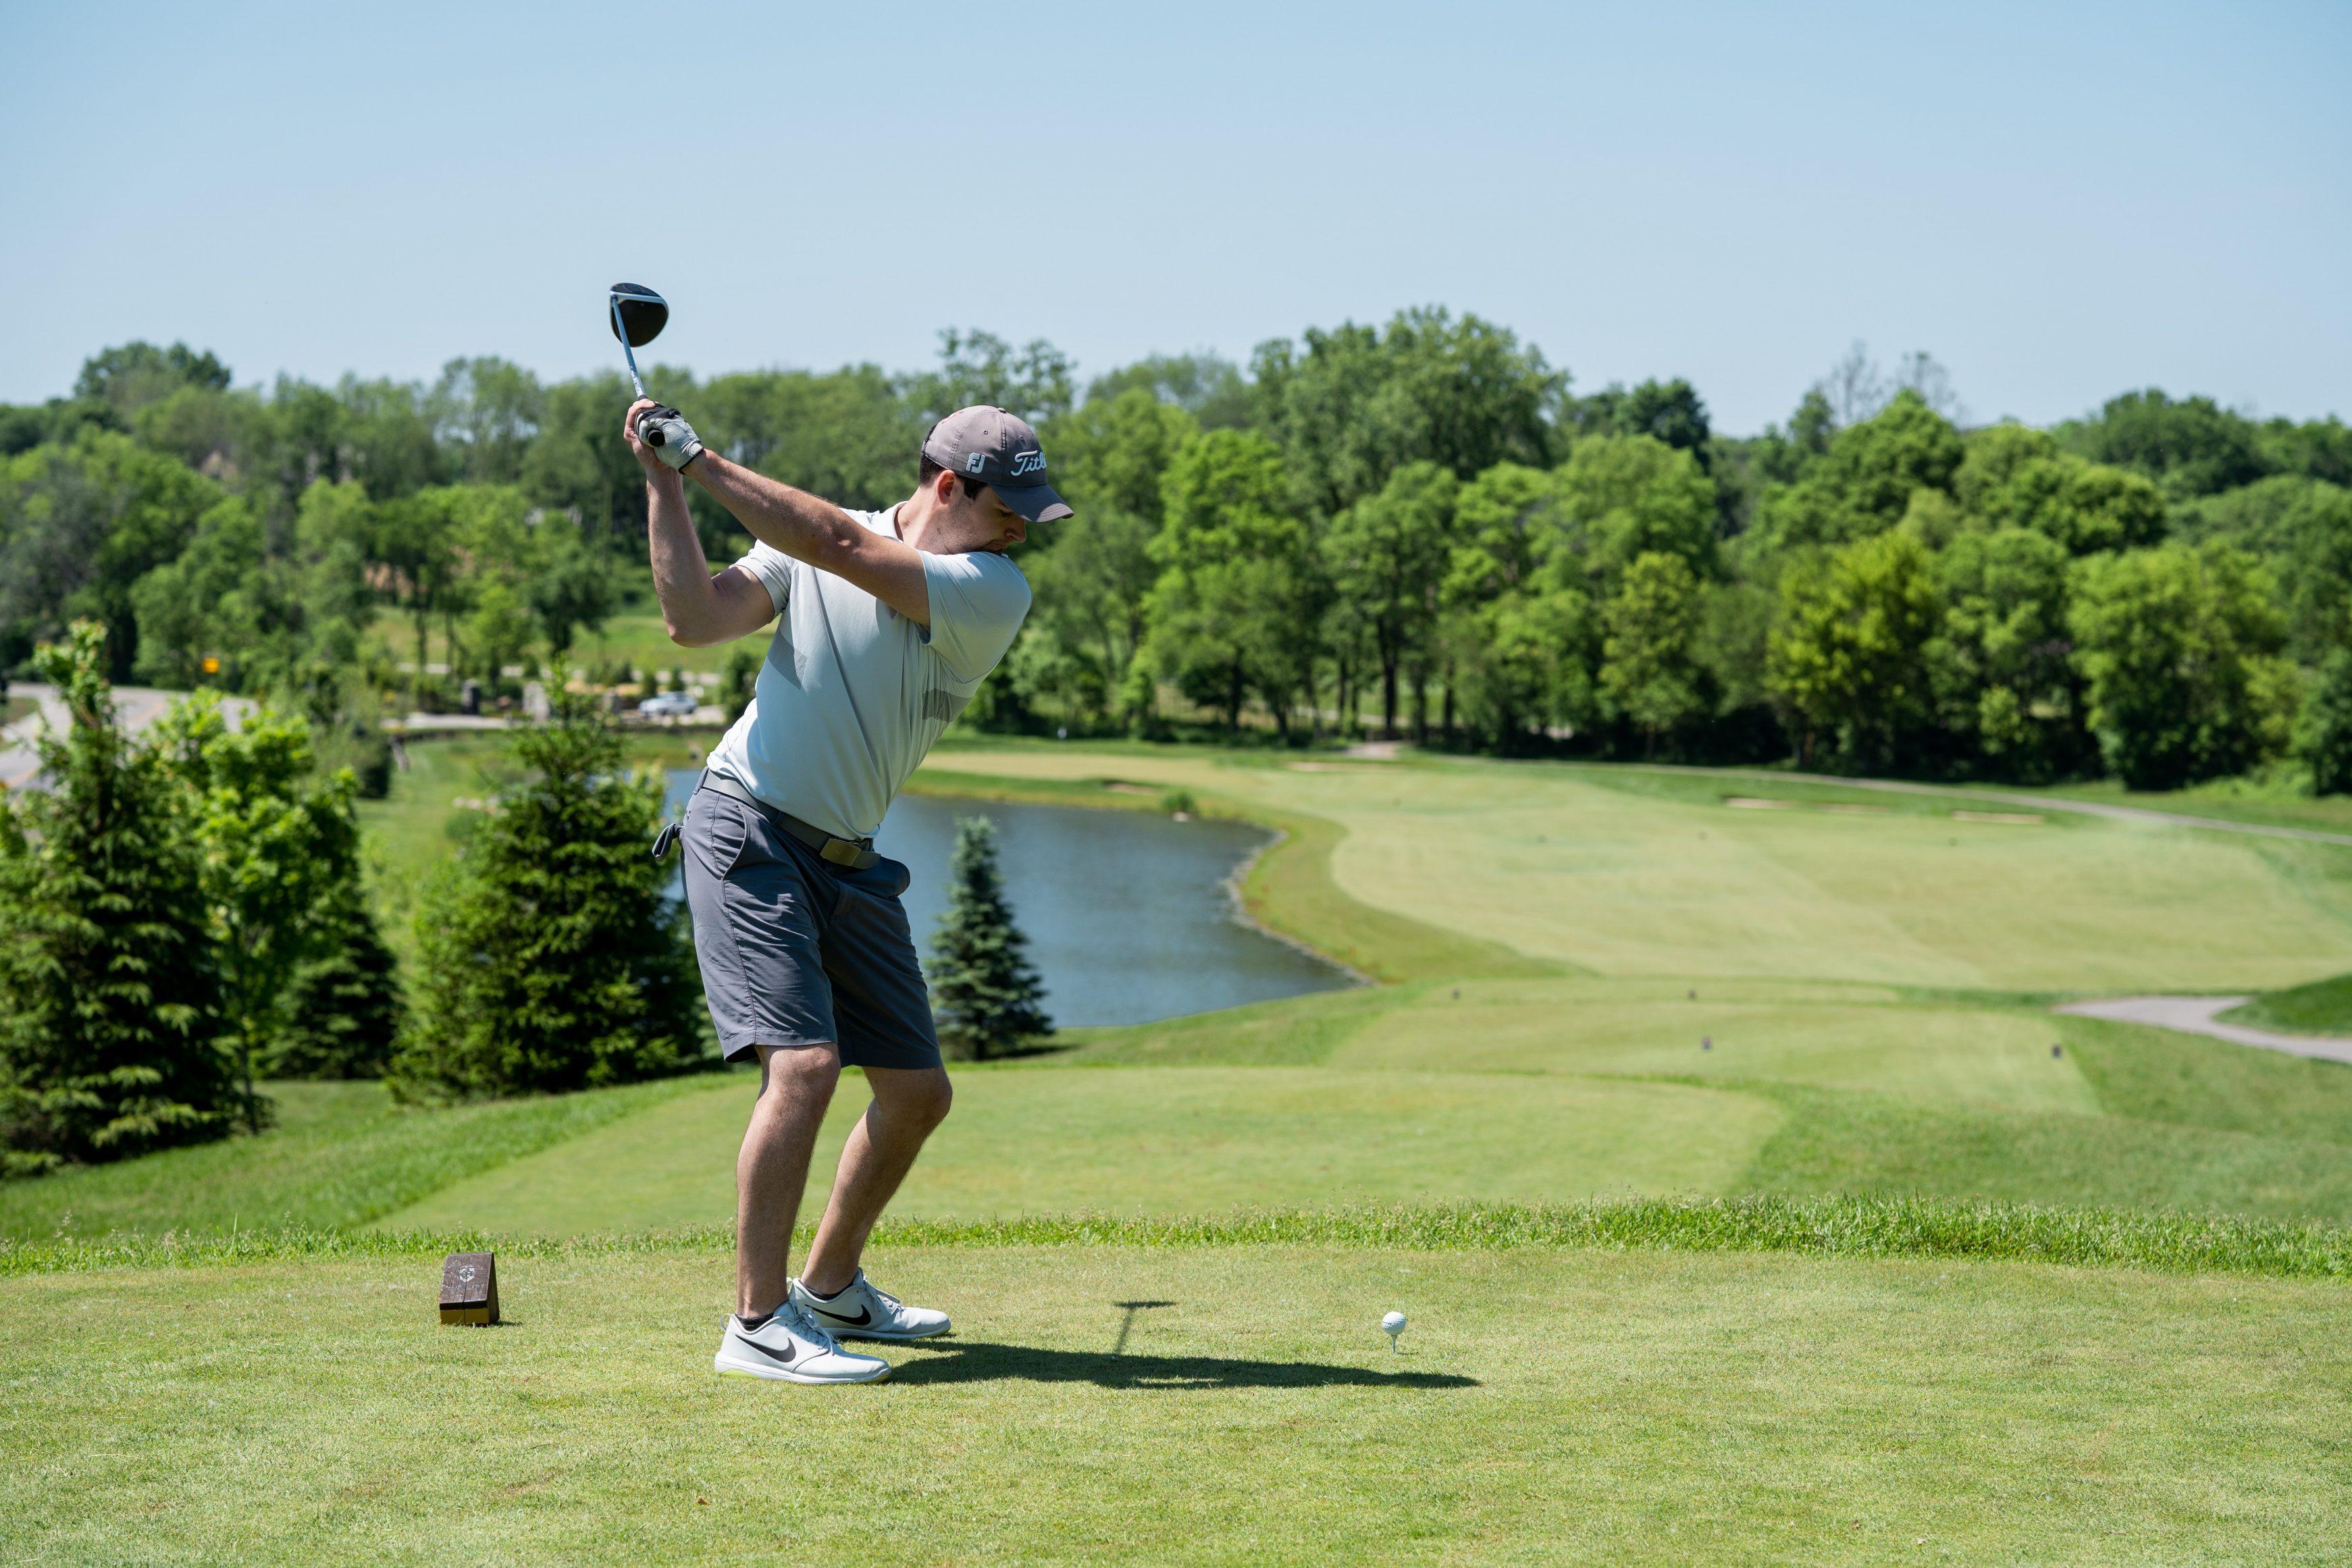 outdoor activities allowed soon including golf